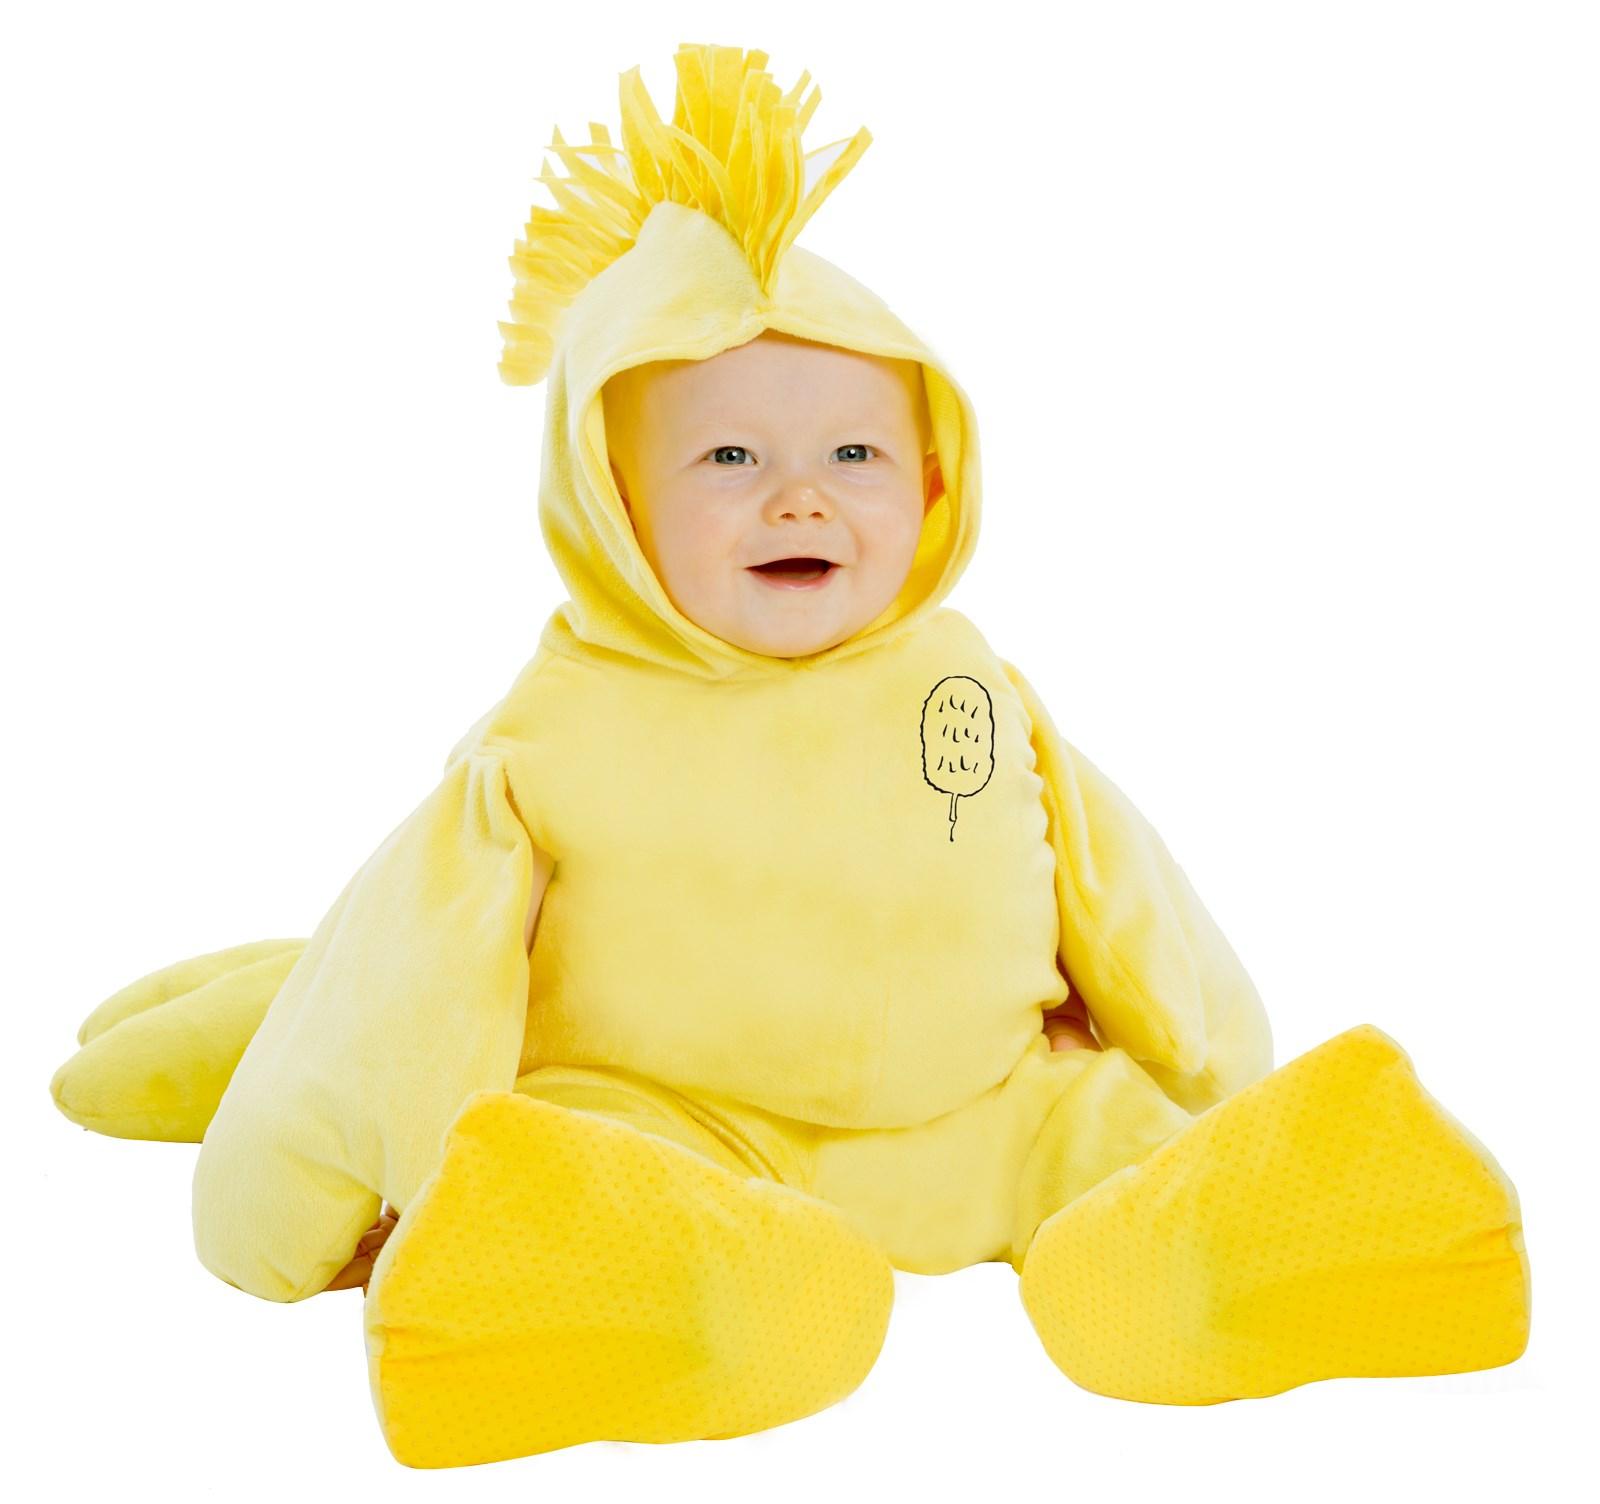 Peanuts: Plush Woodstock Jumpsuit Costume for Infants ...